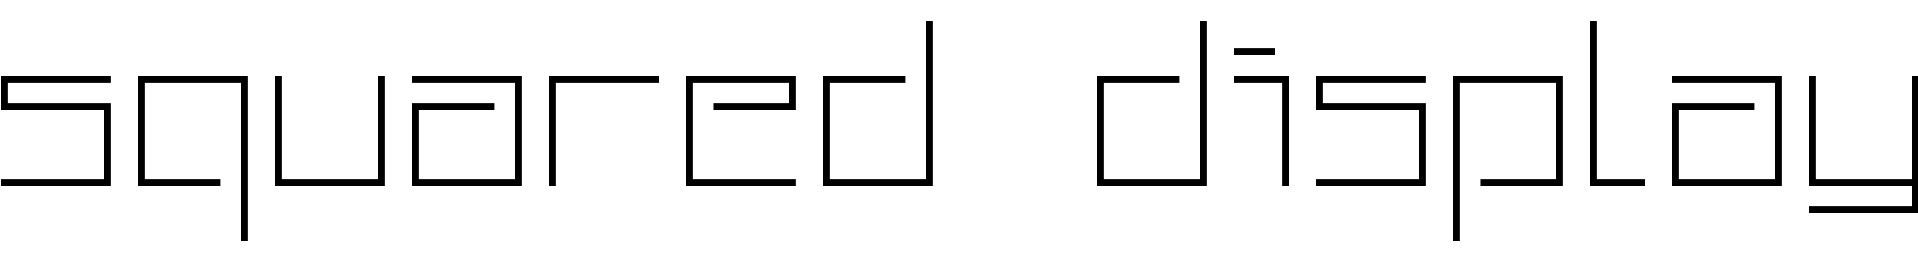 Squared Display